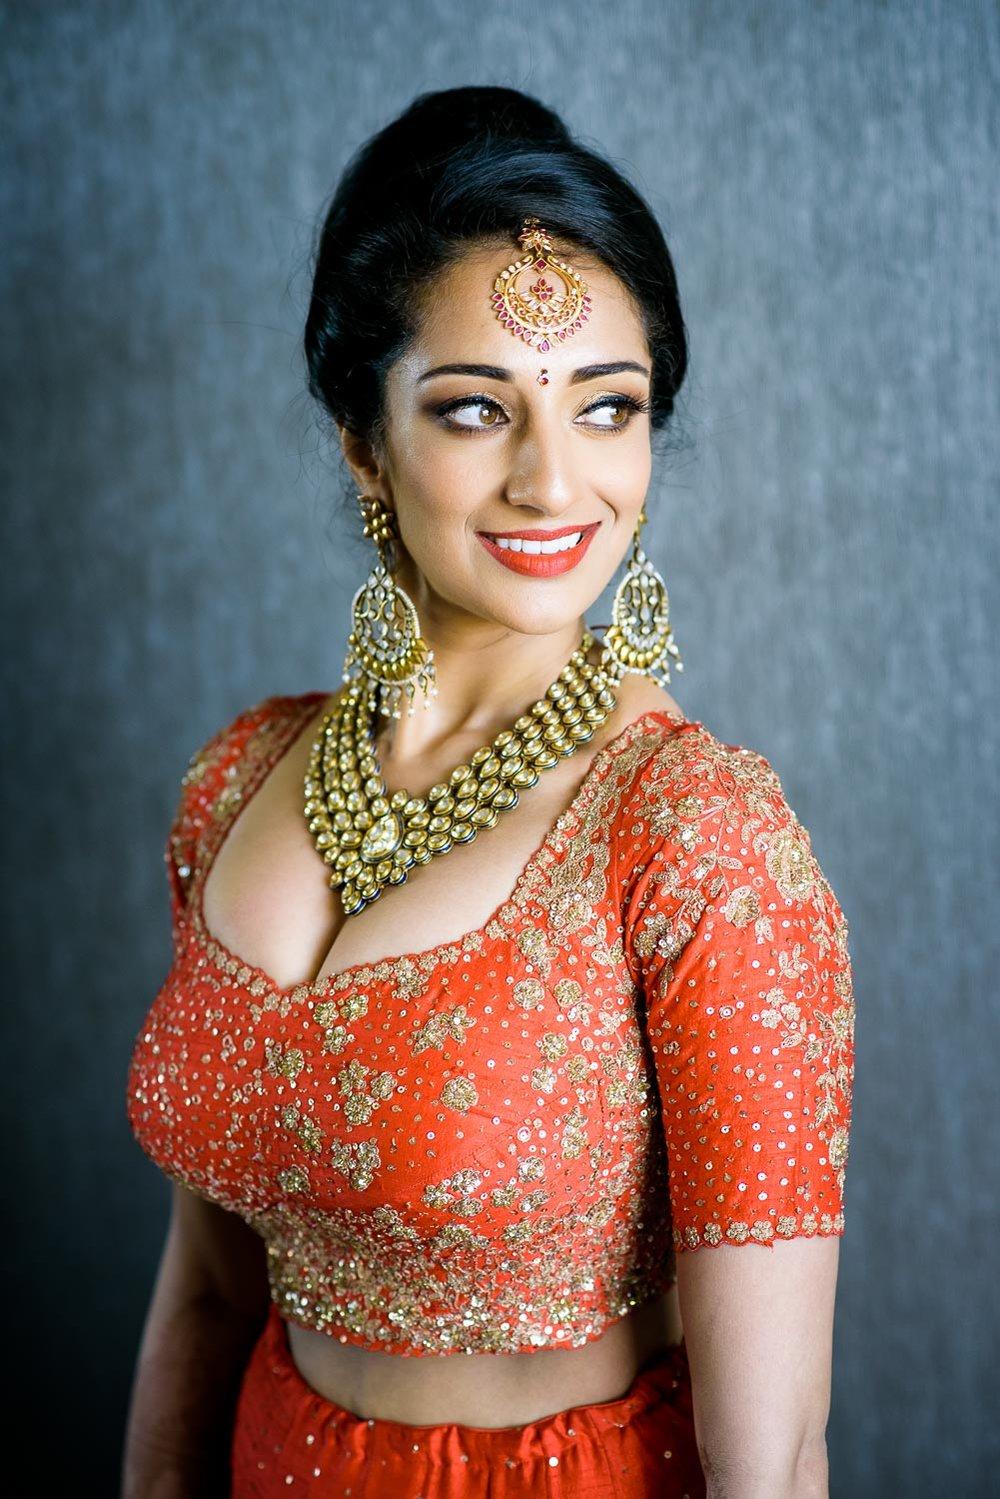 Bridal portrait during a Renaissance Schaumburg Convention Center Indian wedding.